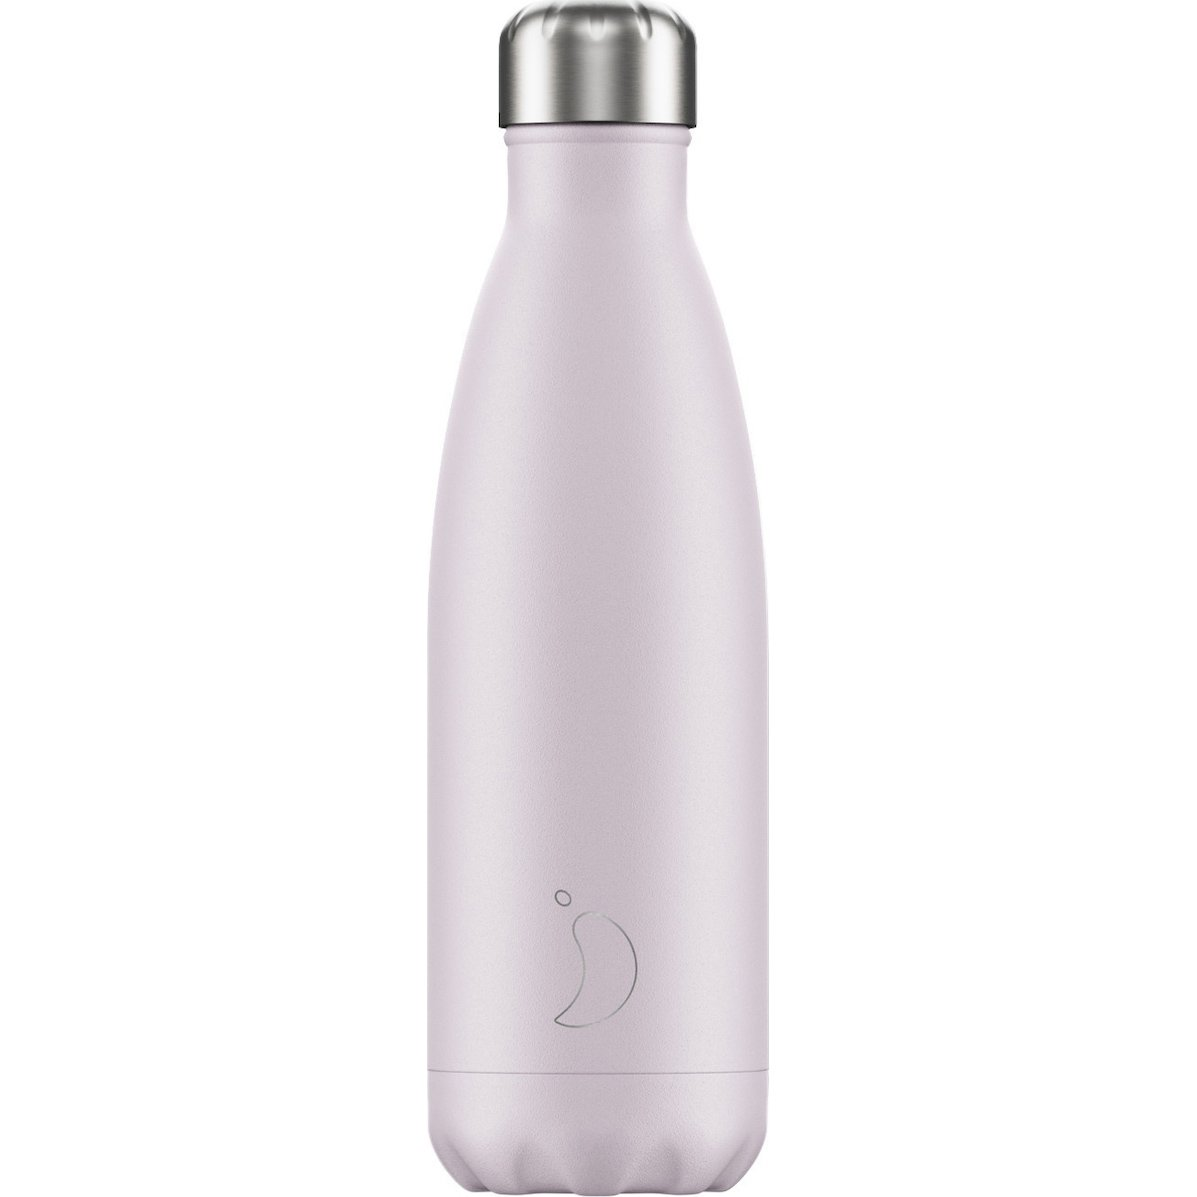 Chilly's Bottle Ανοξείδωτο Θερμός 500ml – Ανοιχτό Μωβ